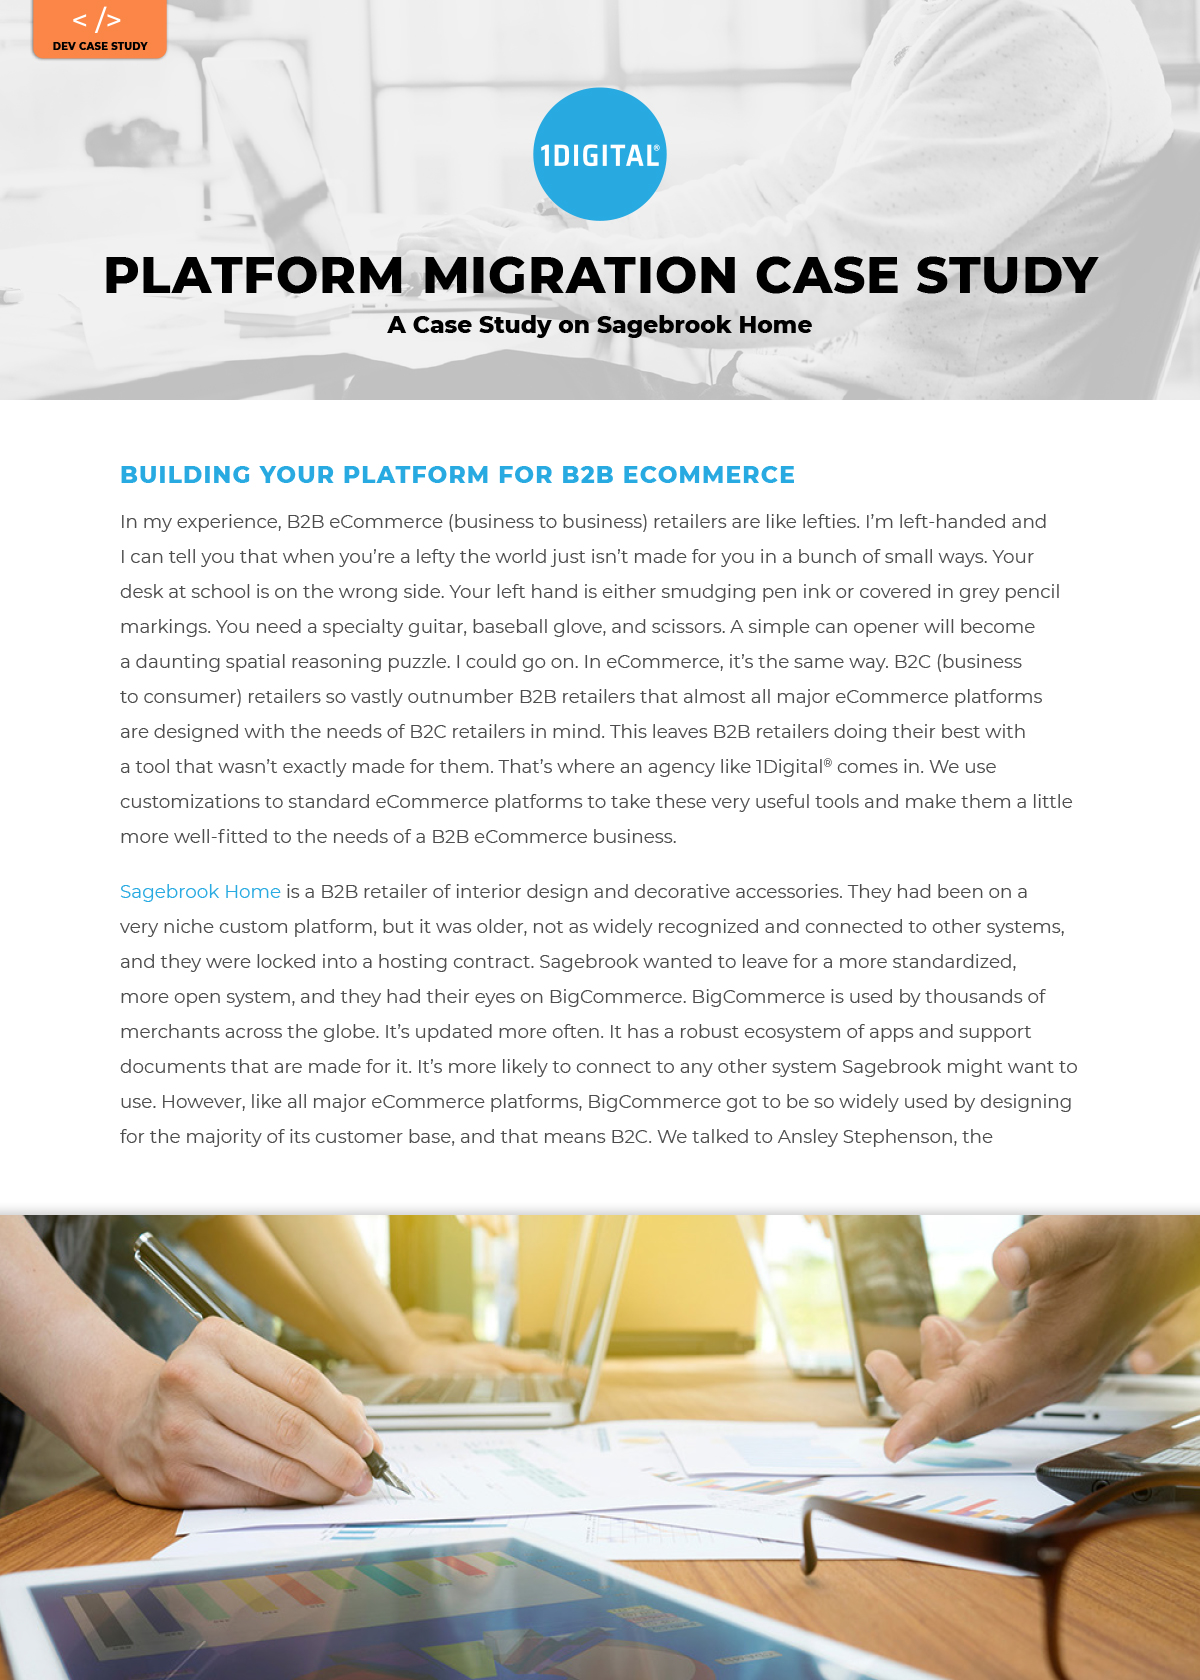 Building Your Platform for B2B Commerce